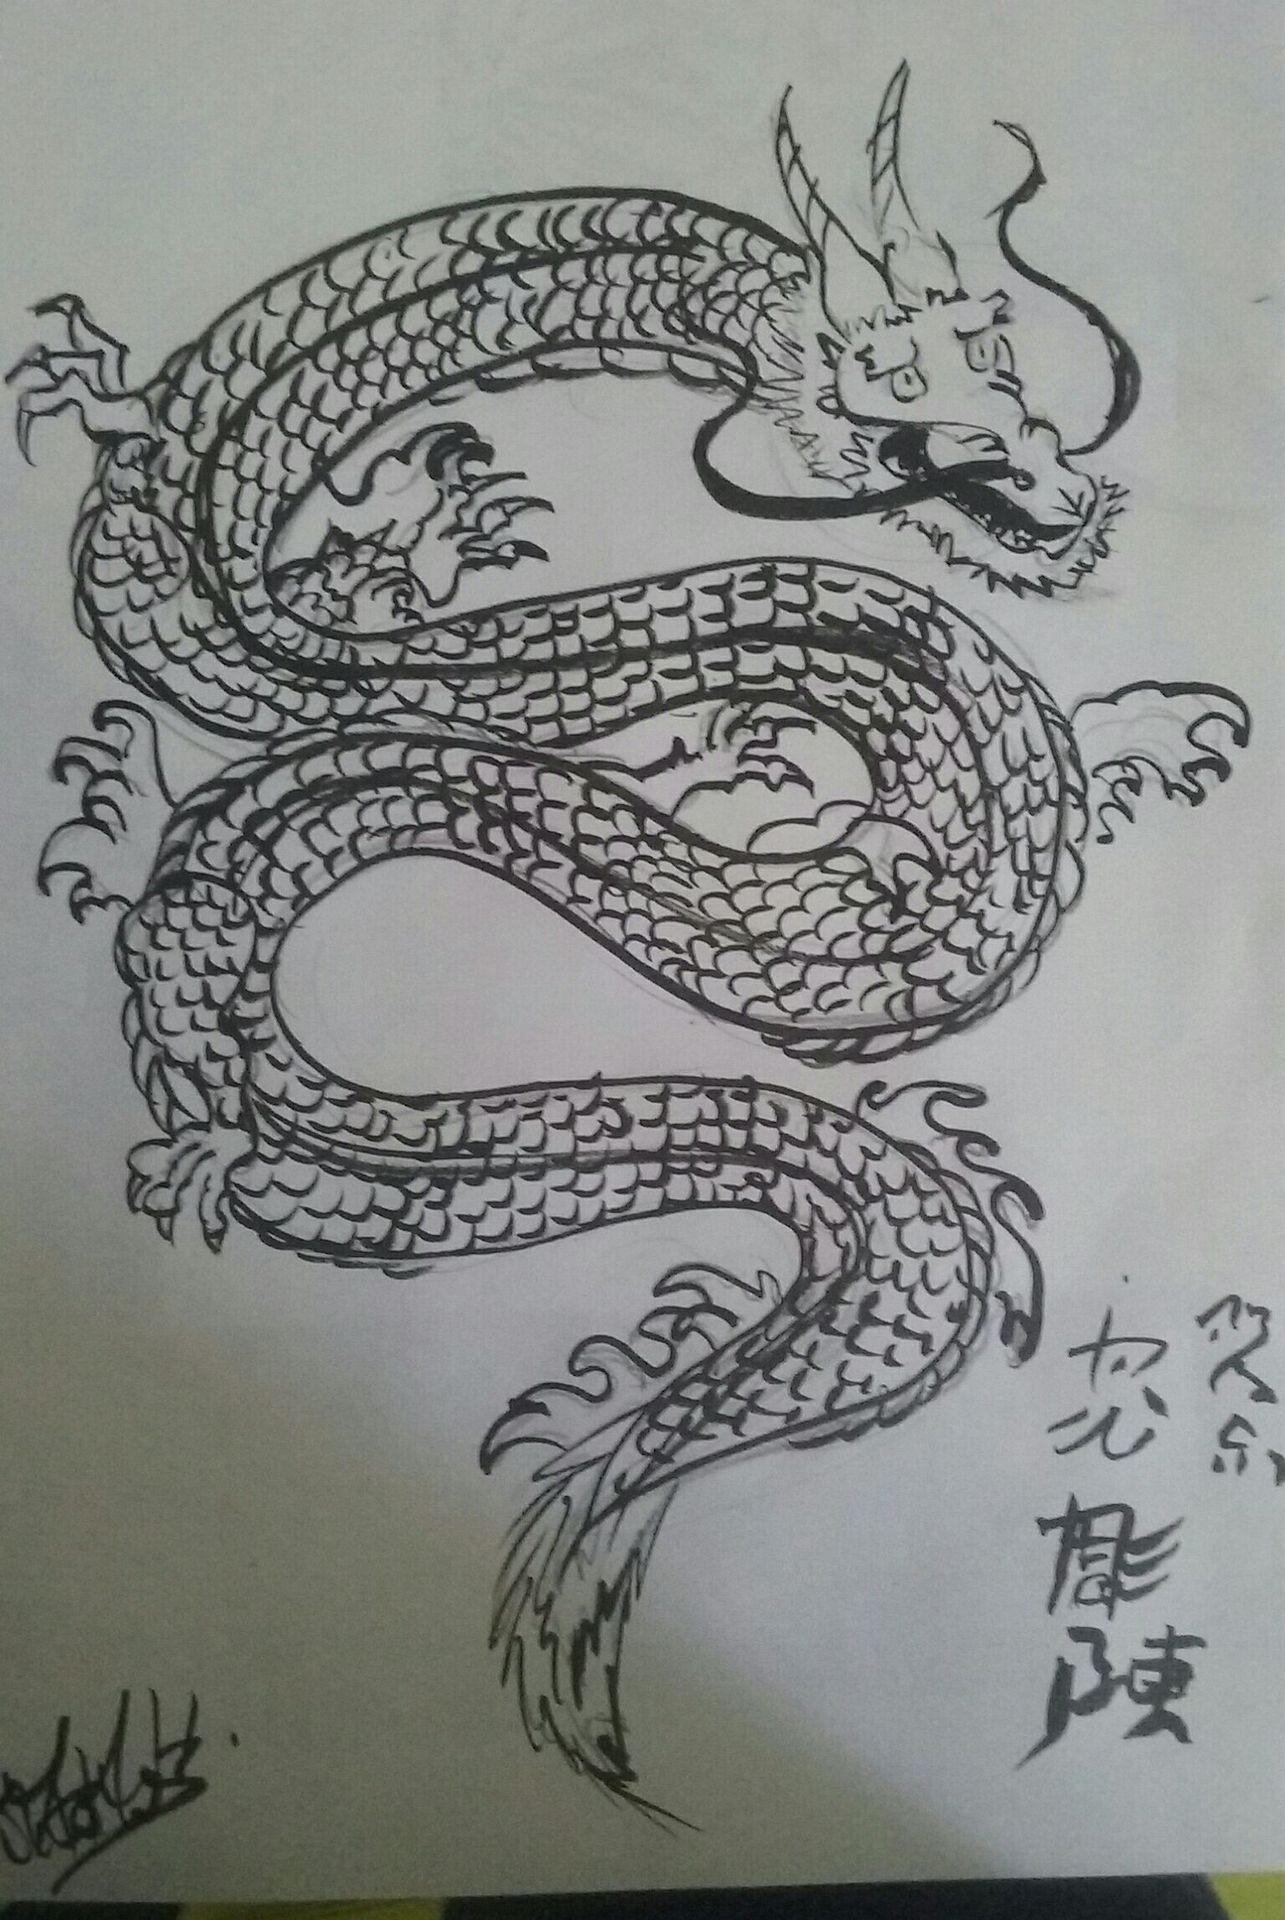 Dessin manga d 39 une otaku un dragon japonais wattpad - Dragon japonais dessin ...